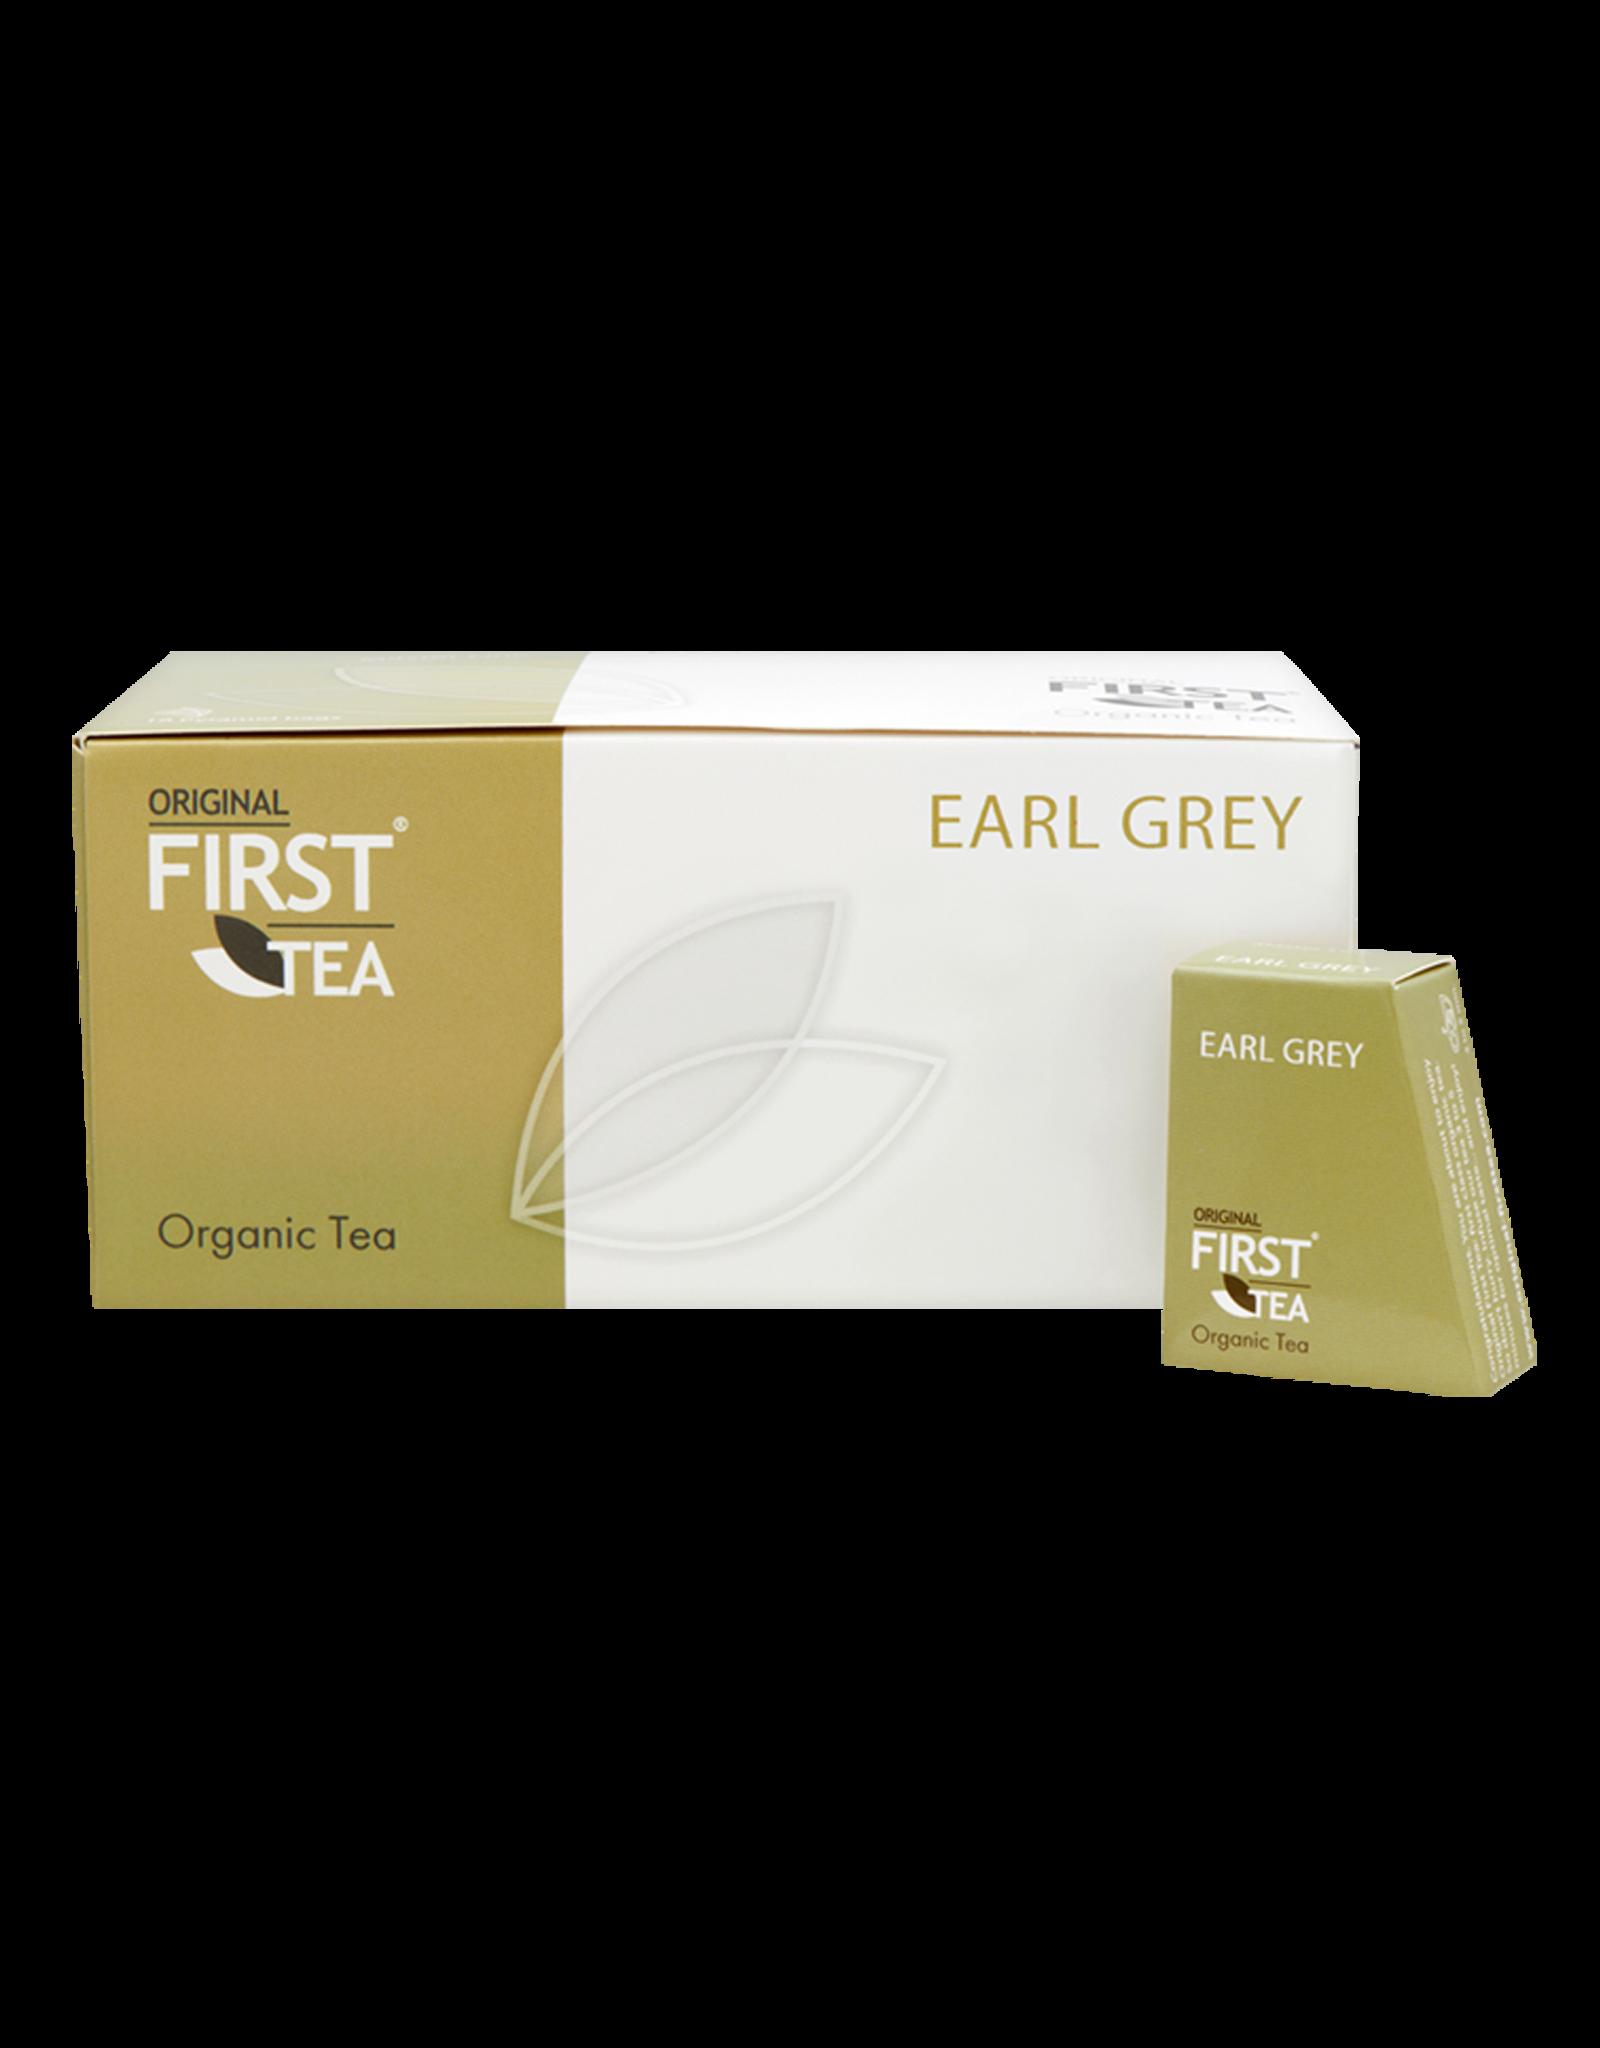 First Tea Master line Masterline Earl Grey